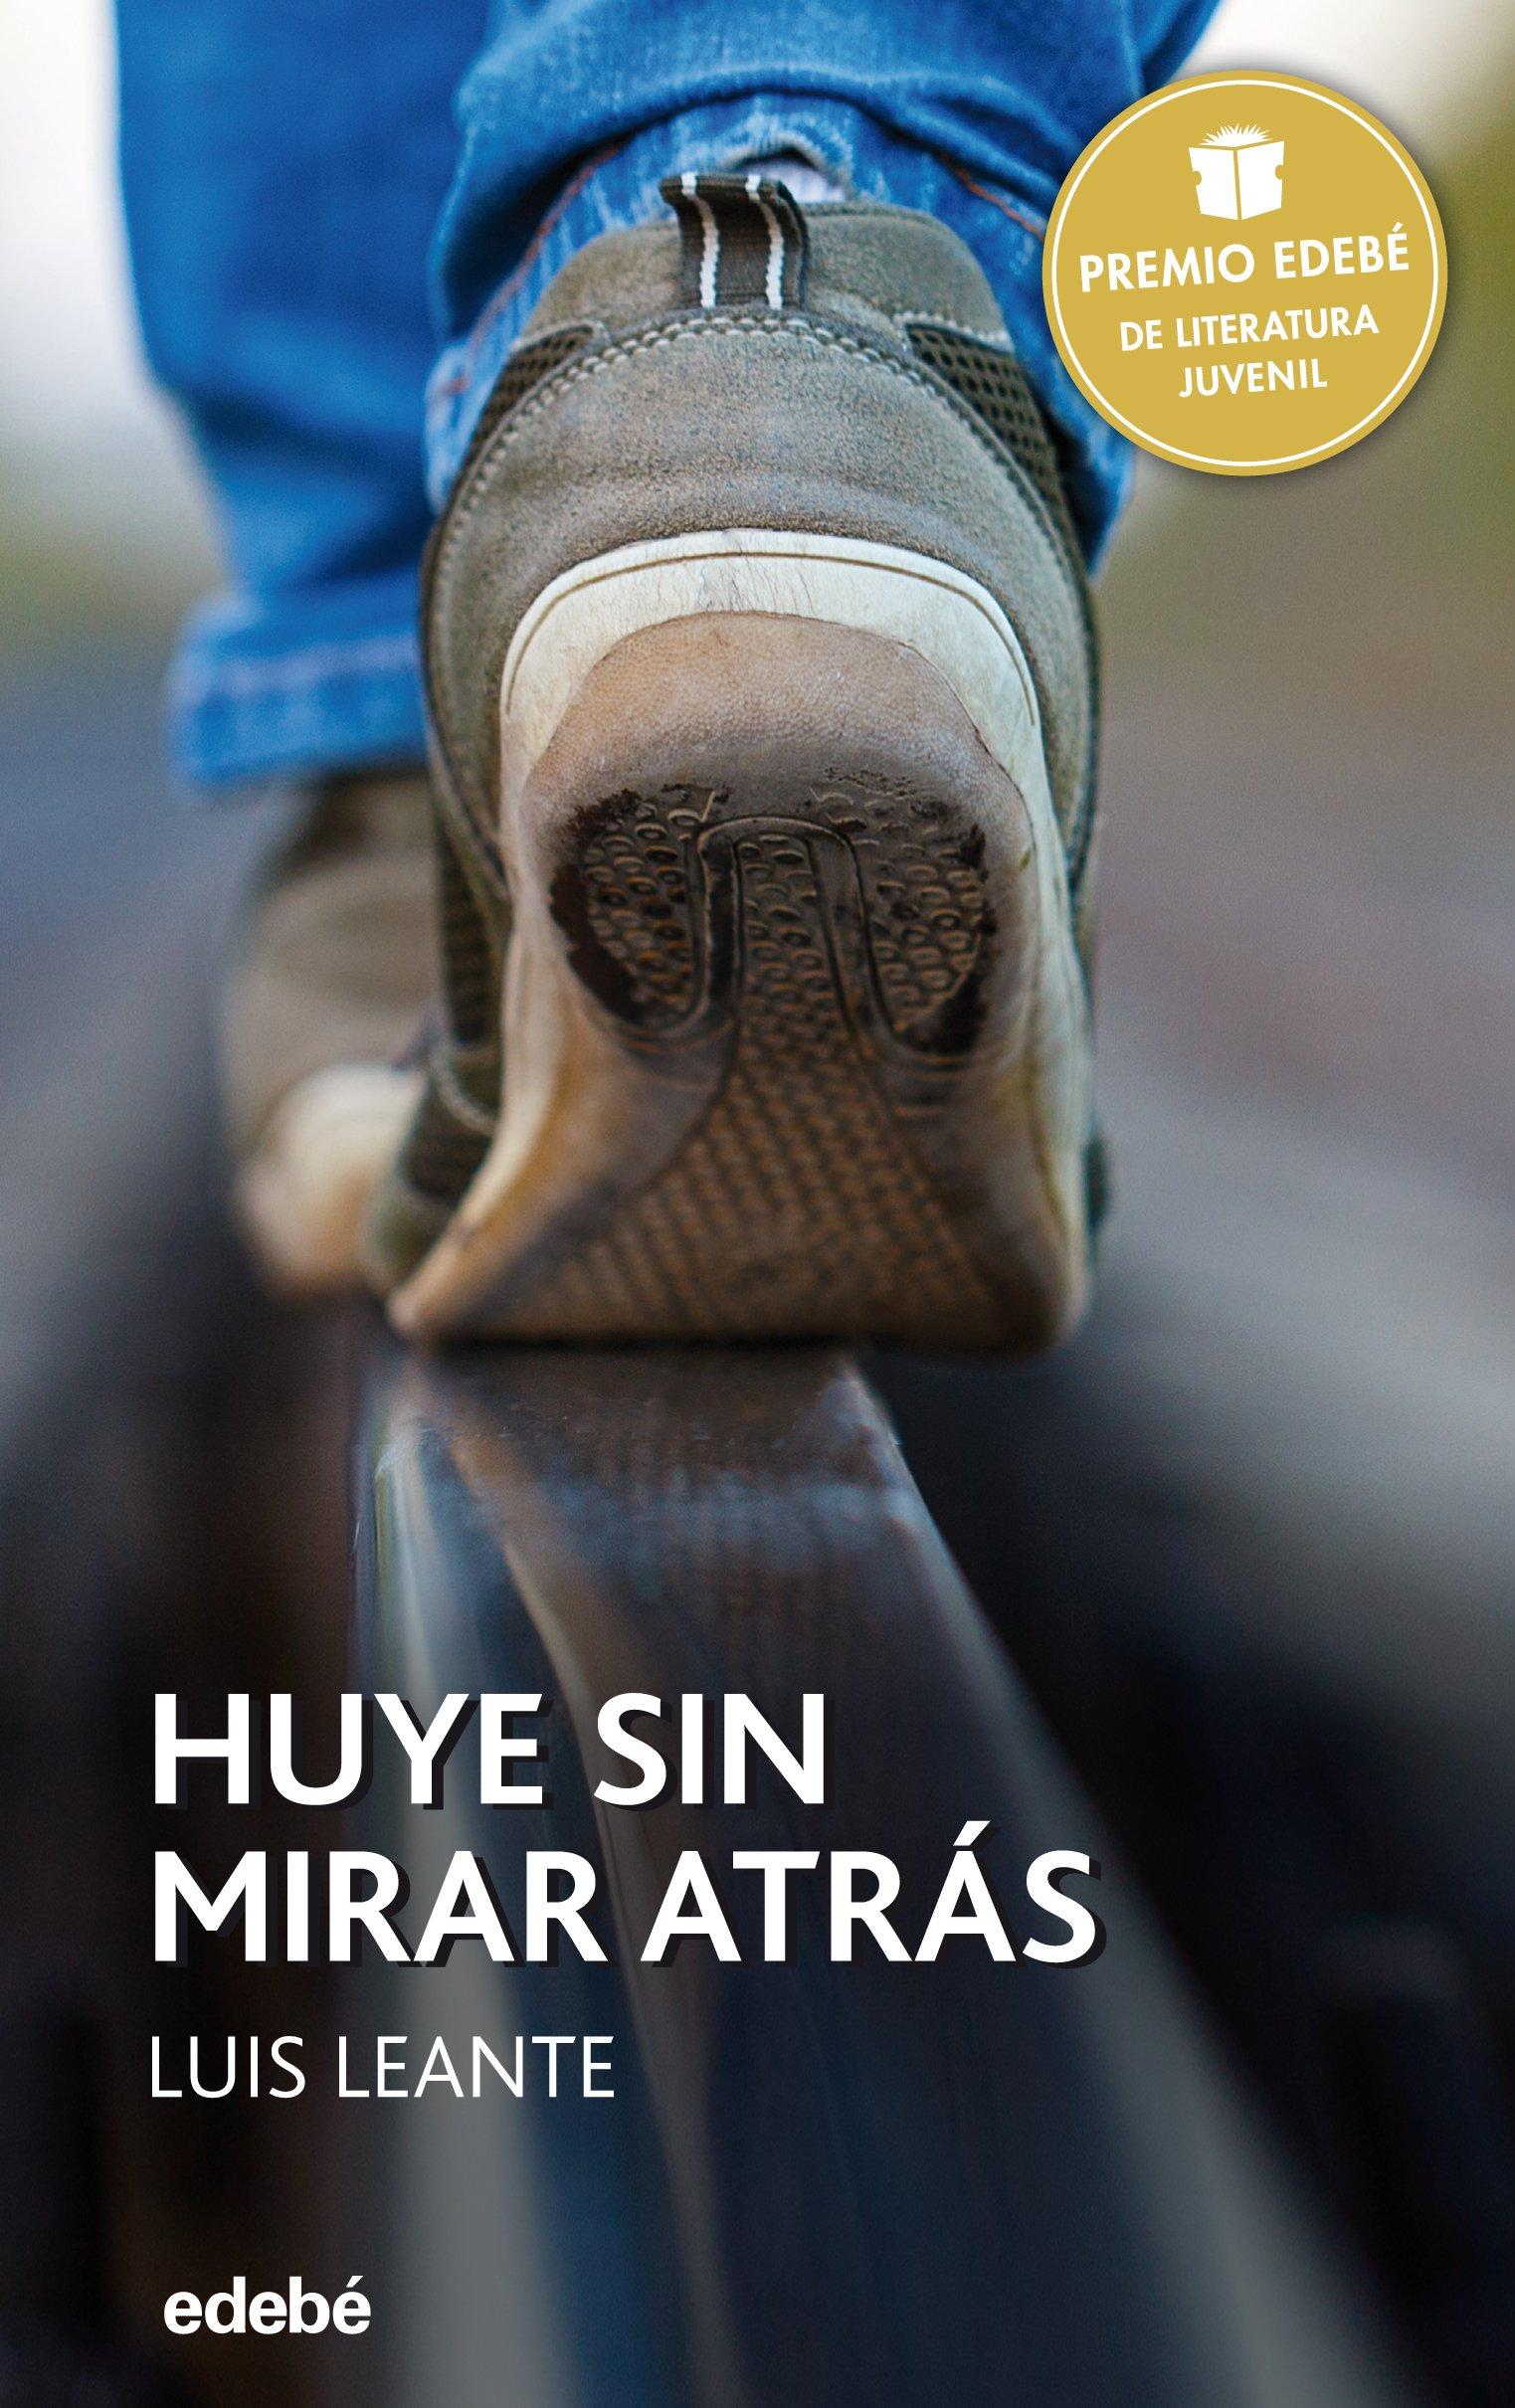 Huye sin mirar atrás (Spanish Edition): Luis Leante, Edebé: 9788468317717: Amazon.com: Books